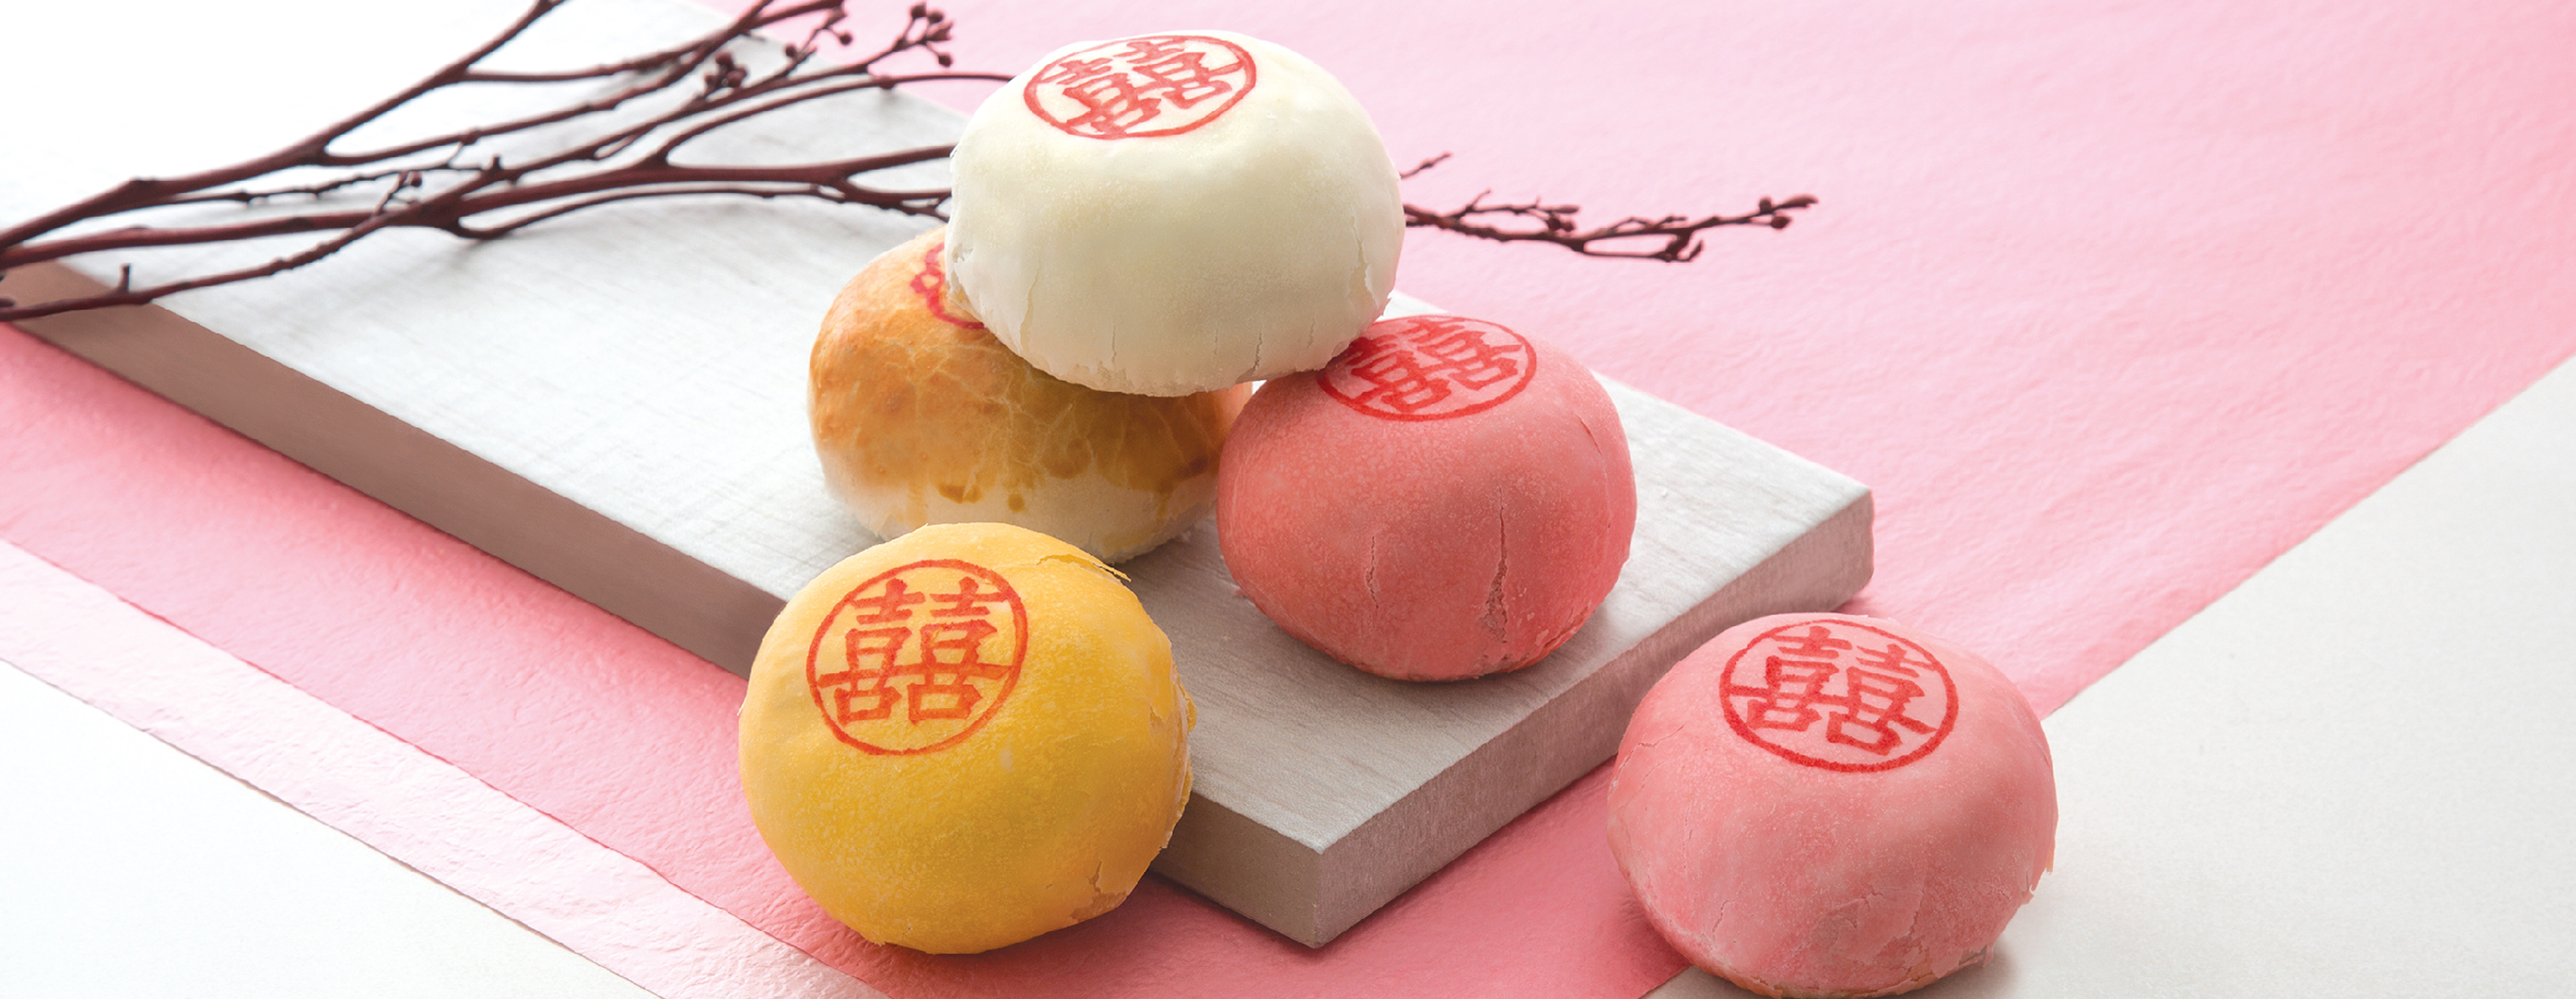 Chinese Bridal Cakes